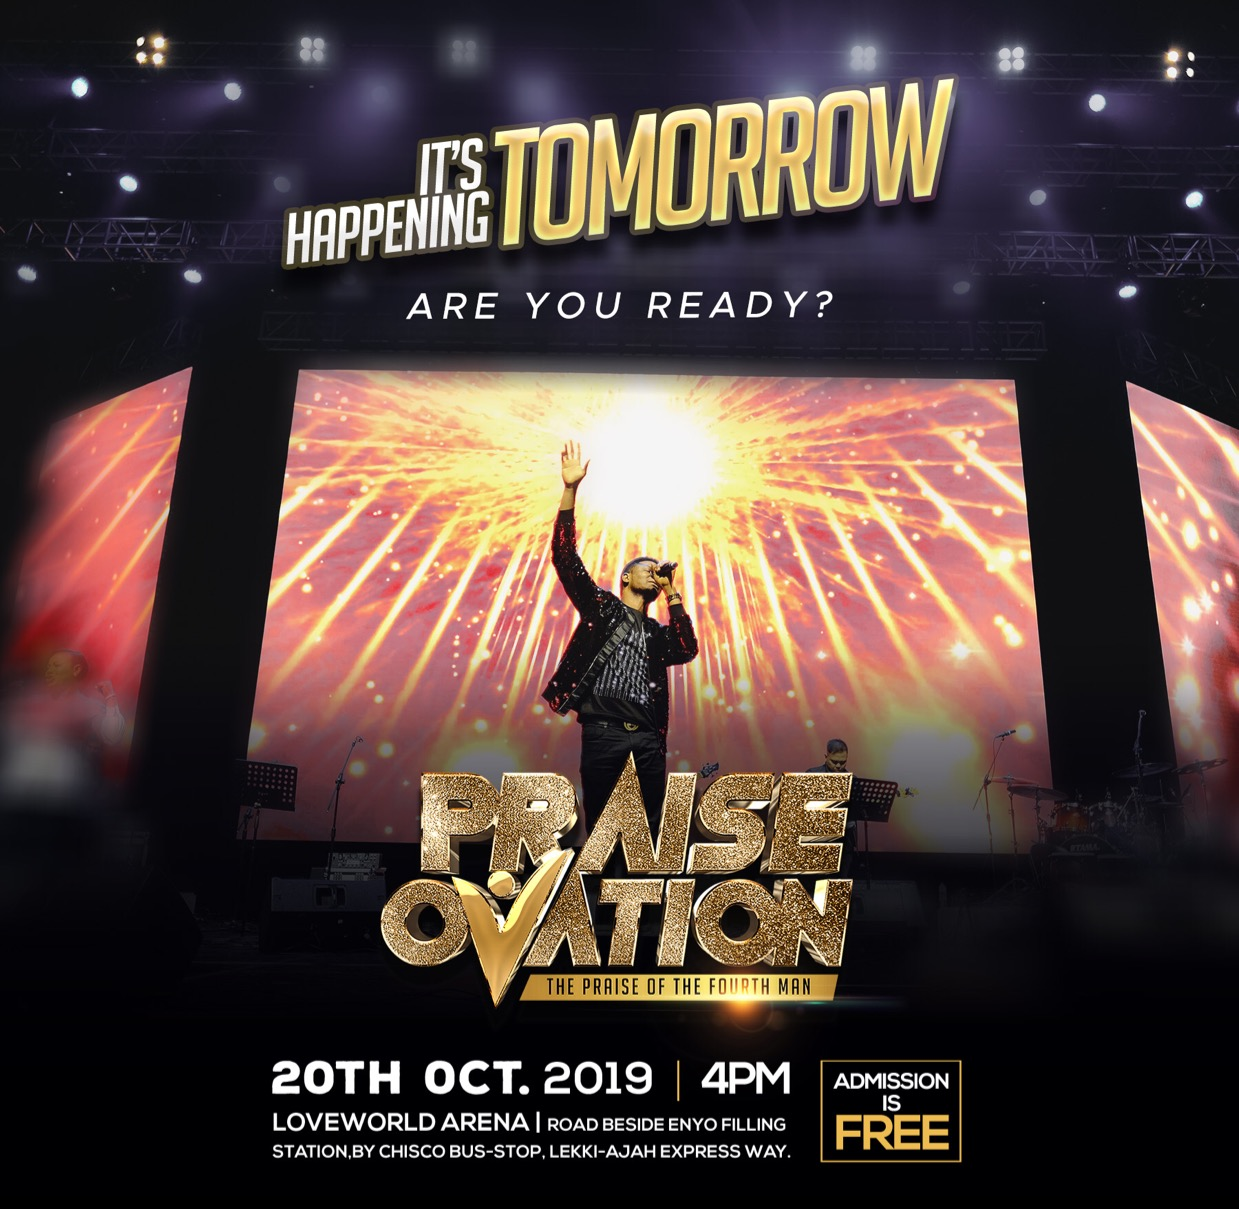 PRAISE OVATION IS TOMORROW... 2